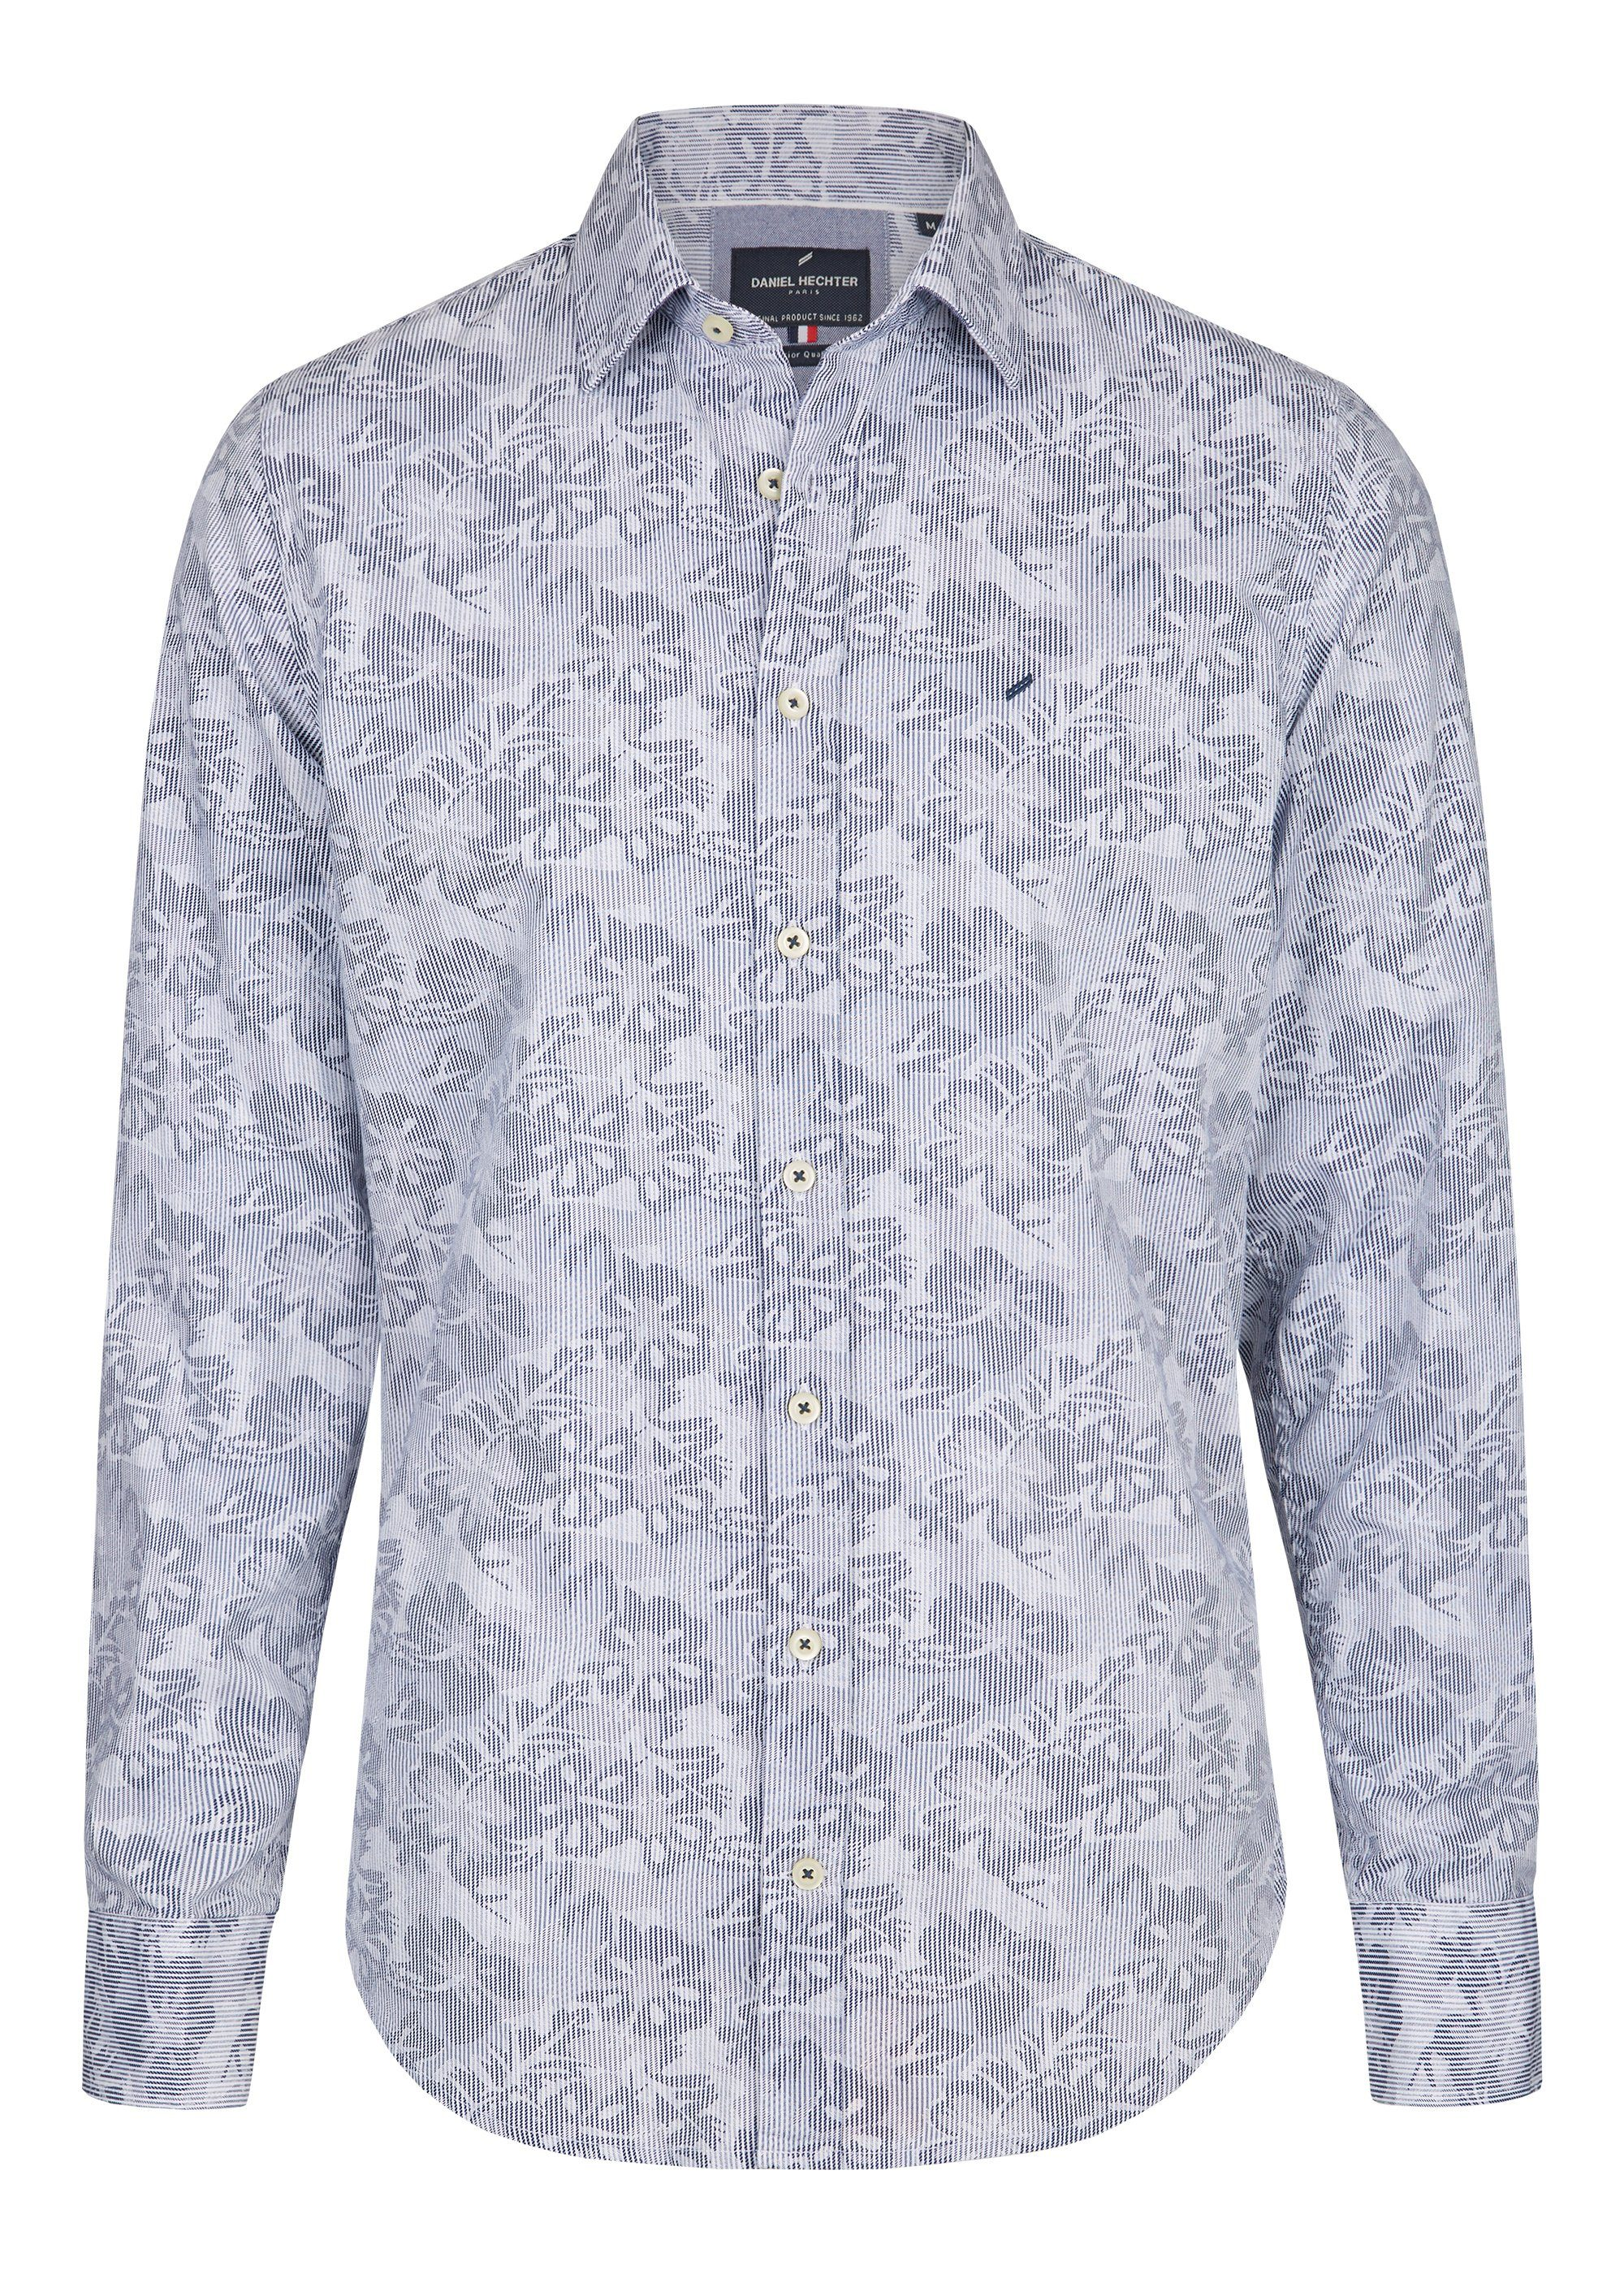 Daniel Hechter Cooles Freizeit Hemd | Bekleidung > Hemden > Freizeithemden | Daniel Hechter